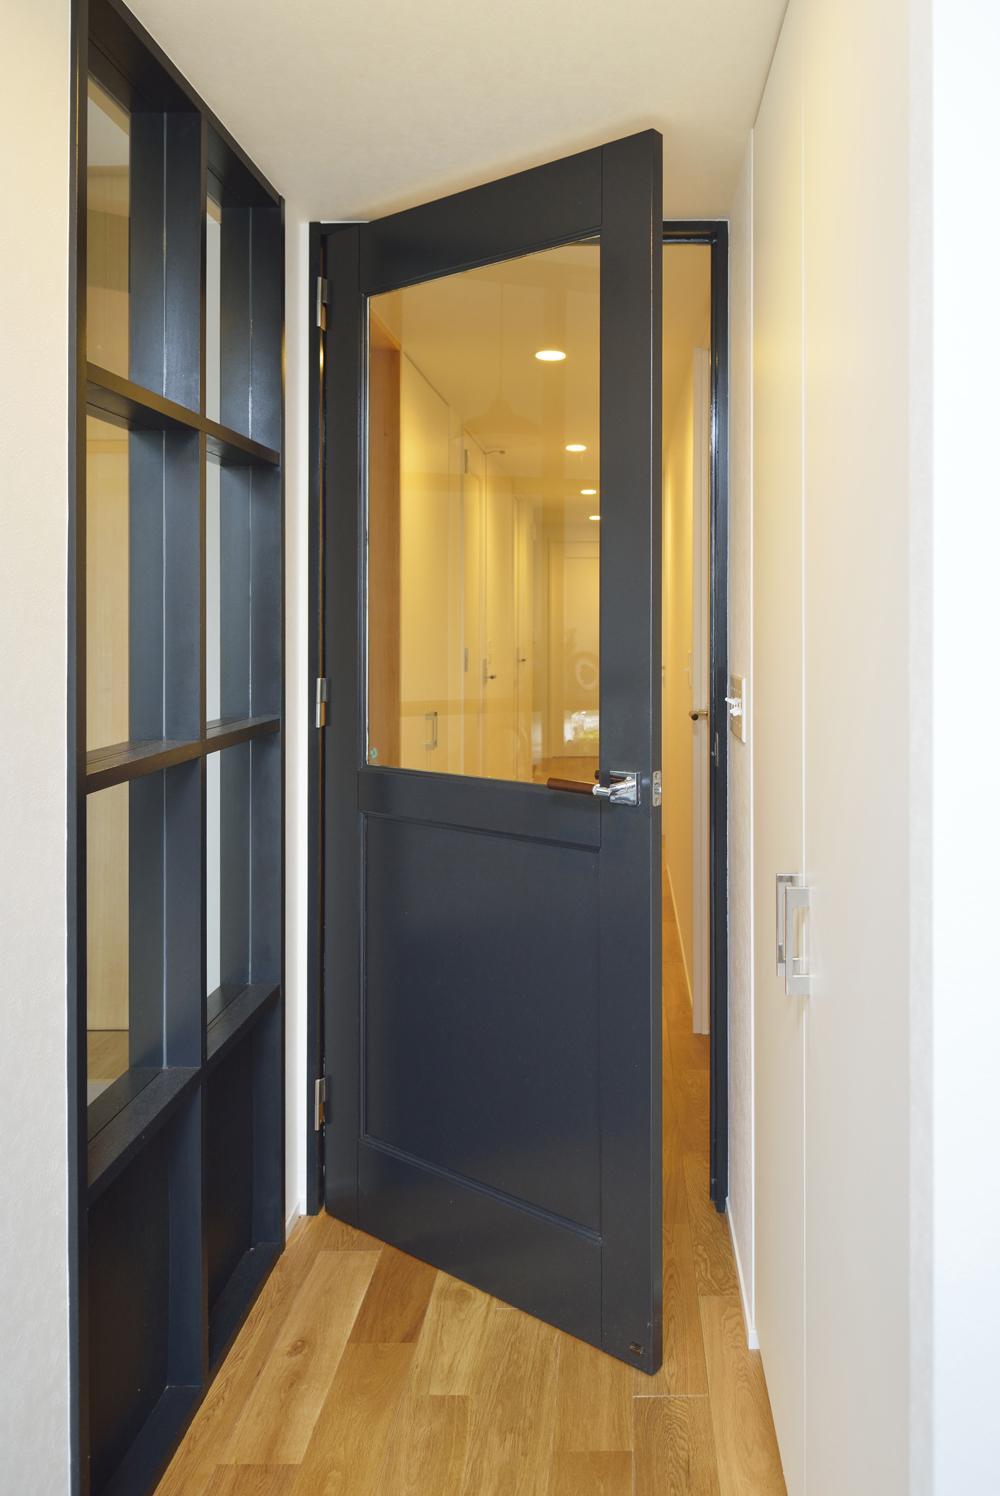 N邸・素足が気もち良い 広々リビングの部屋 畳スペースの建具とリビングドア